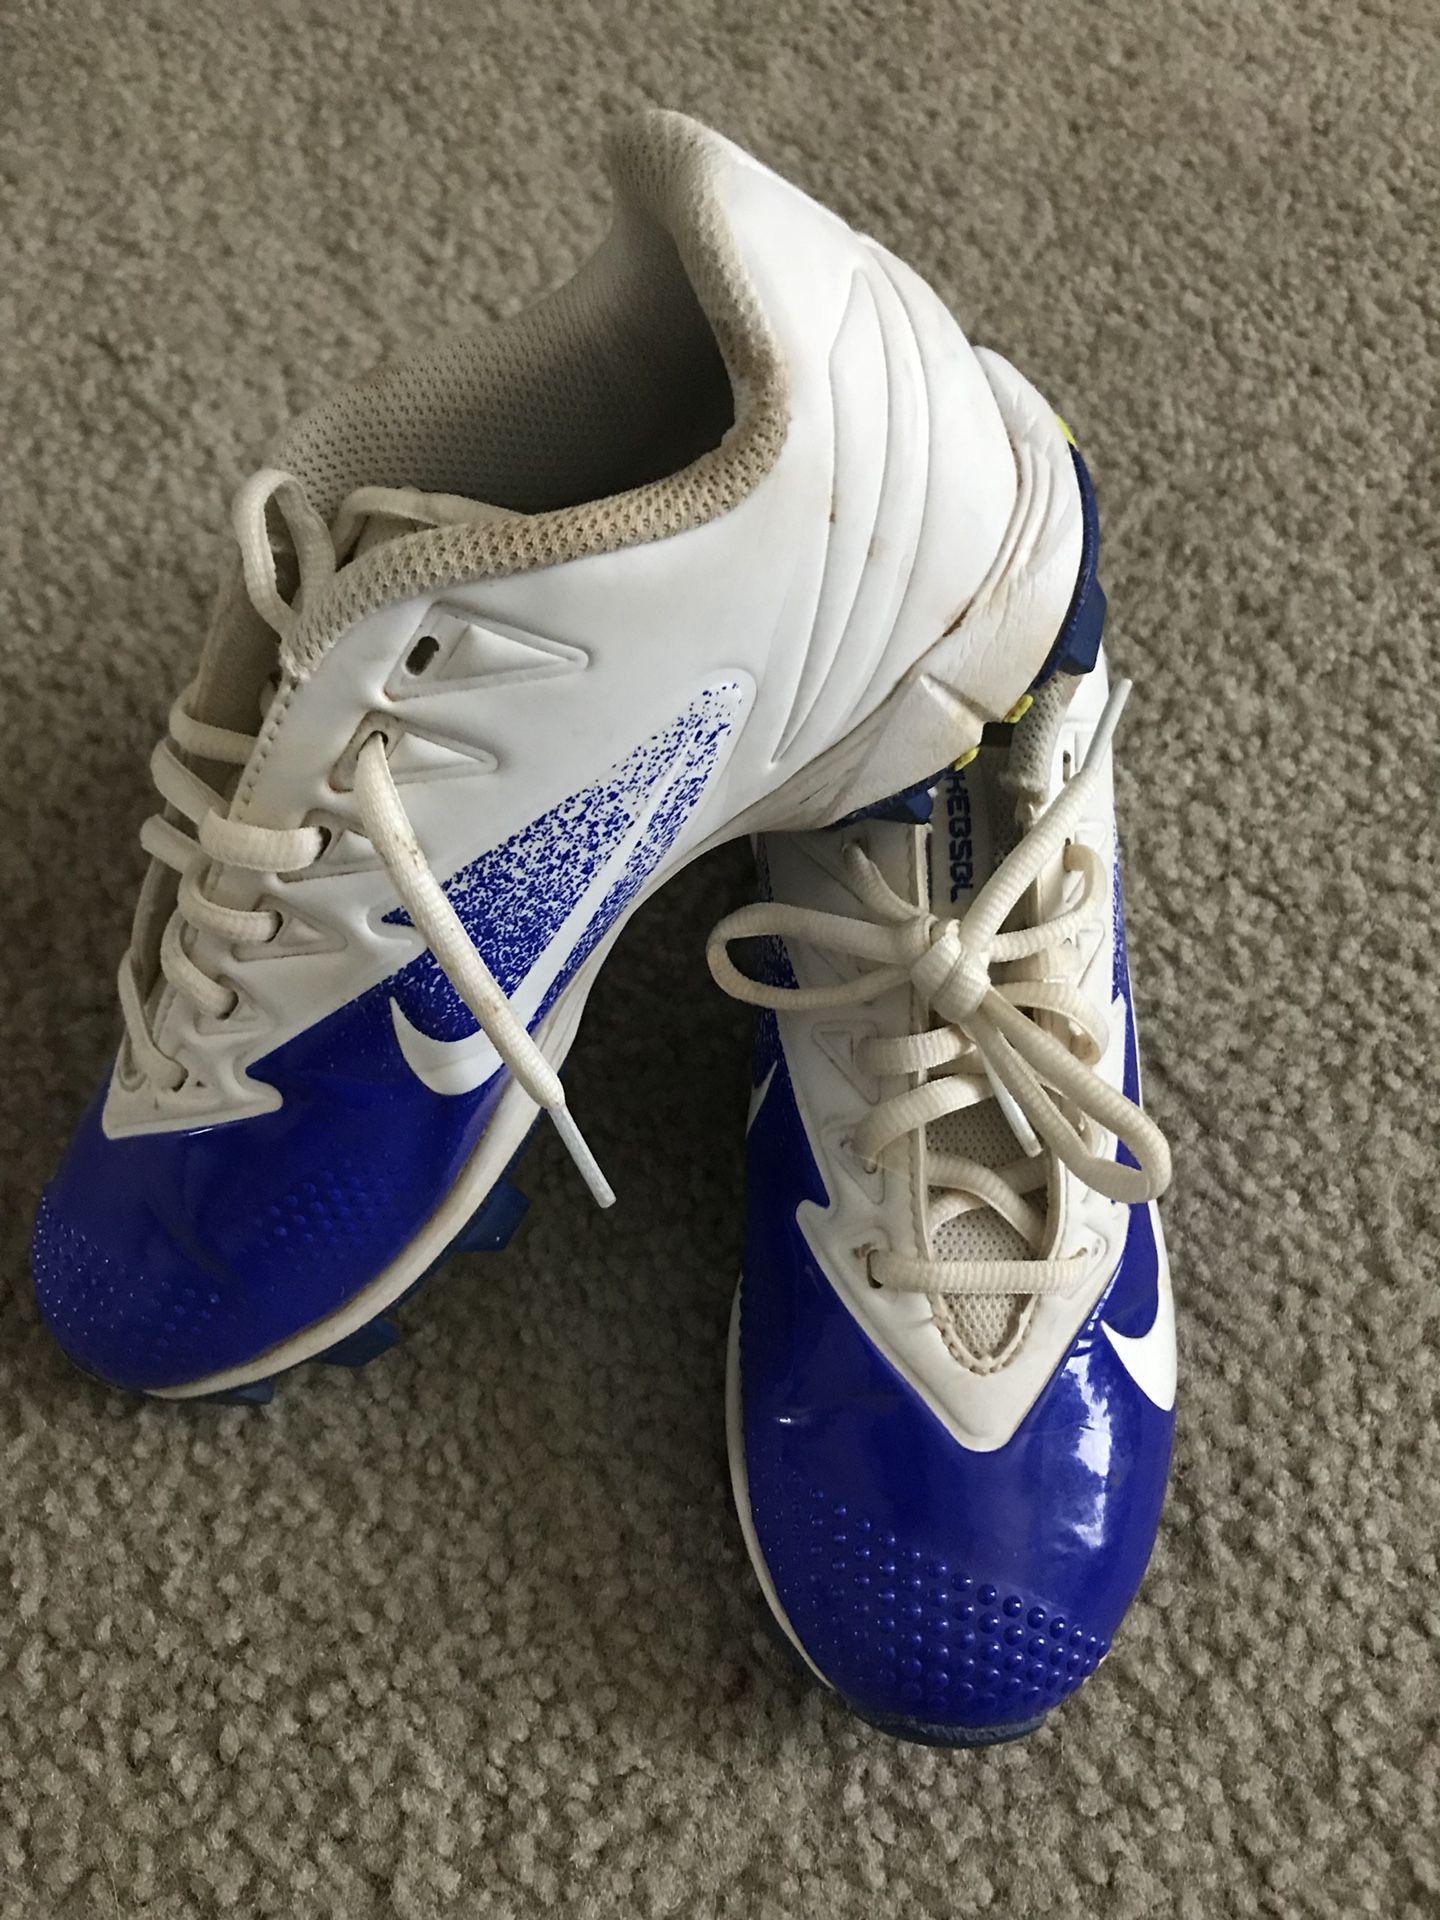 Nike Vapor youth baseball cleats size 2.5